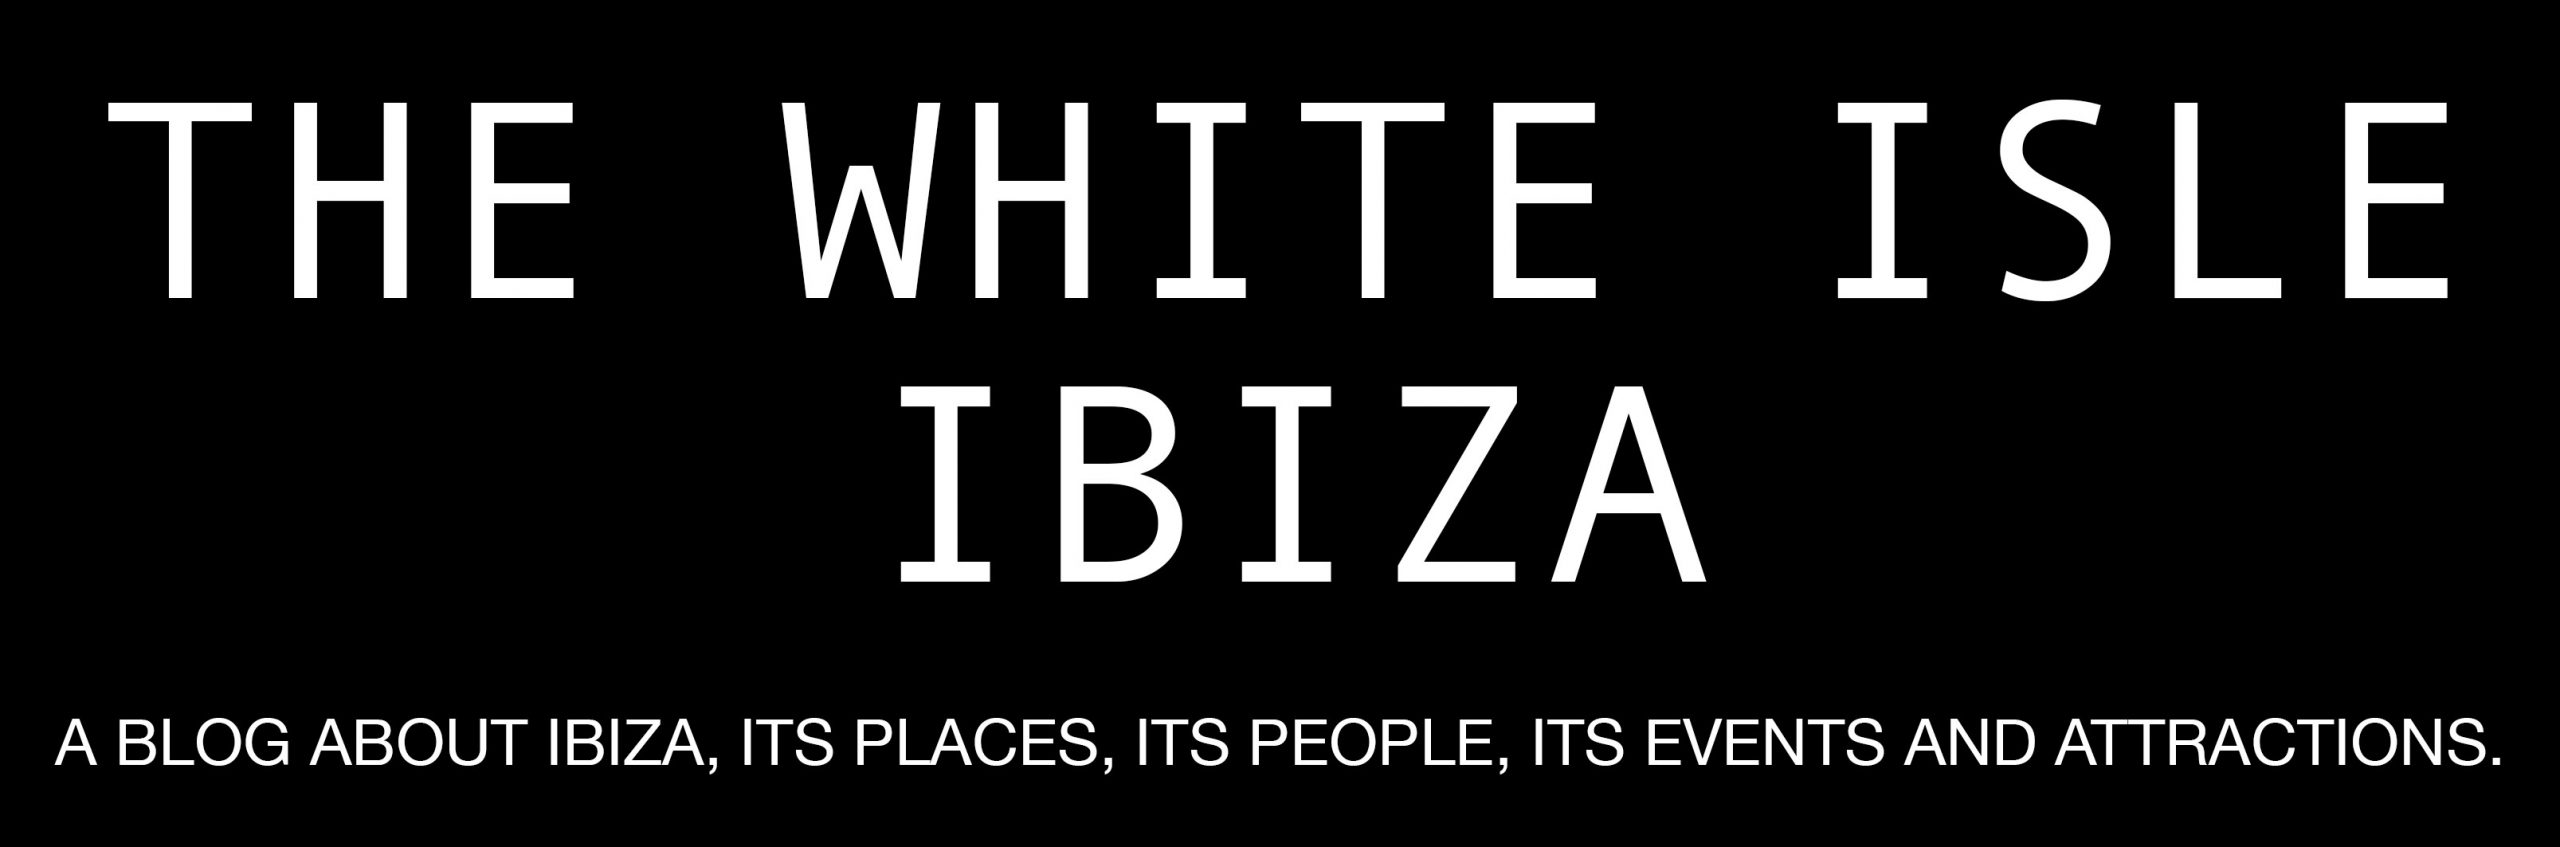 The White Isle Ibiza Blog